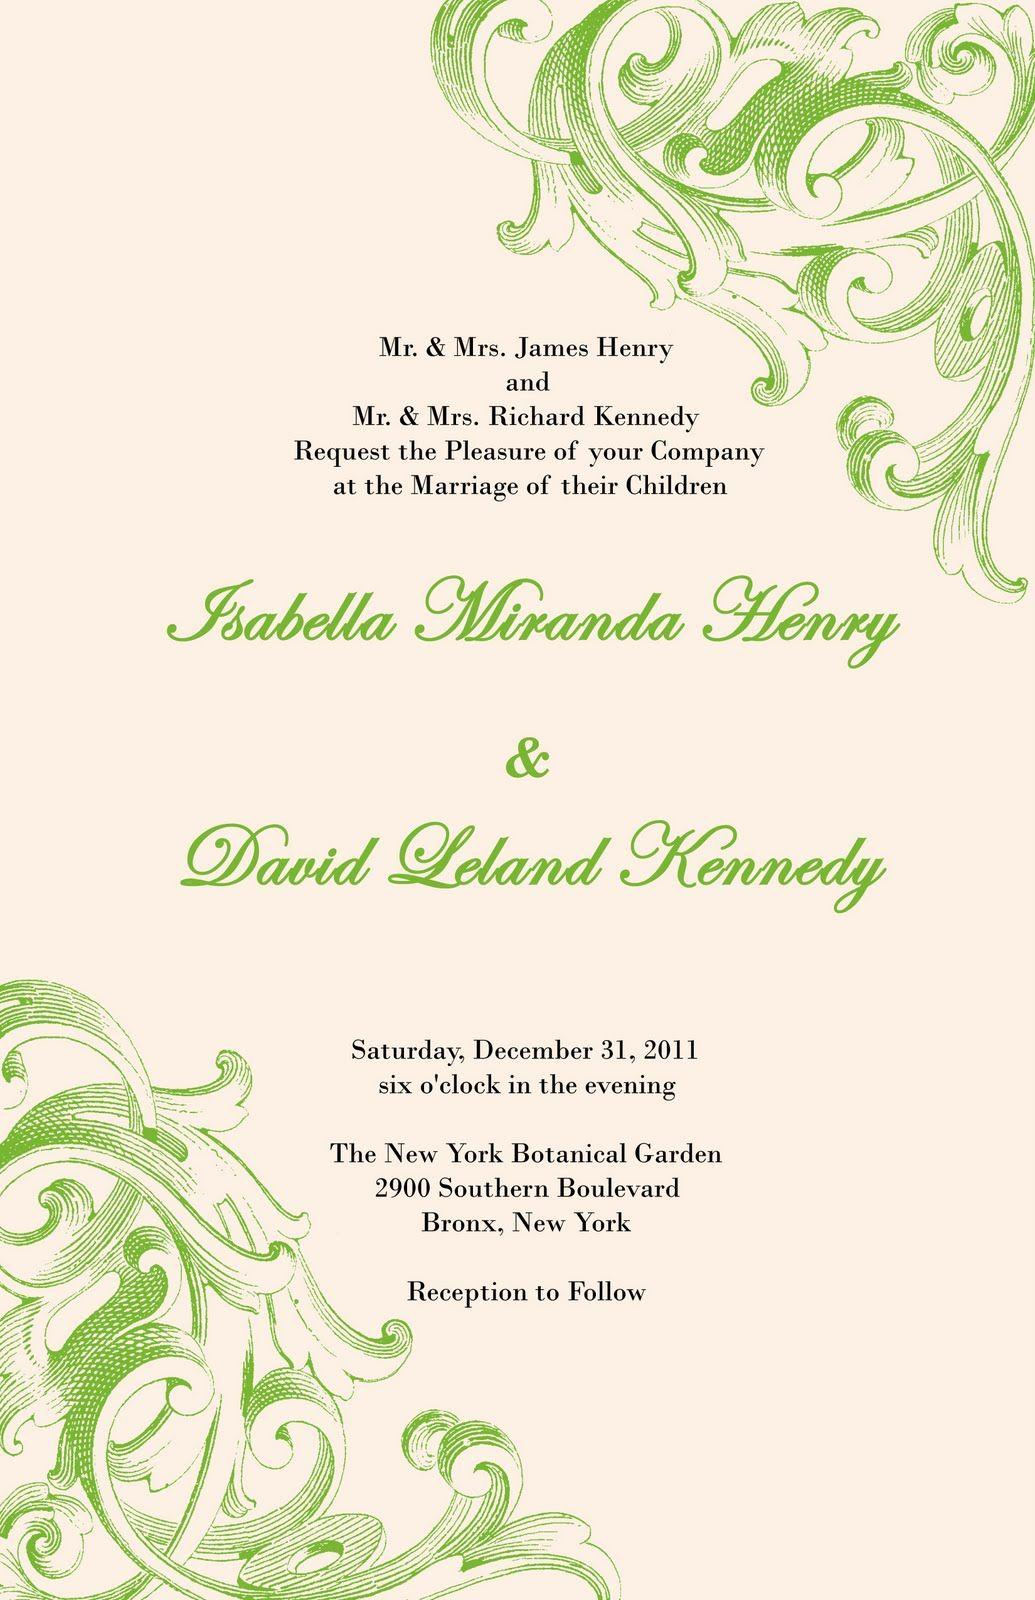 Elegant And Beautiful Wedding Invitations For Free Victorian Style Invitation Design: Victorian Elegant Wedding Invitations At Reisefeber.org